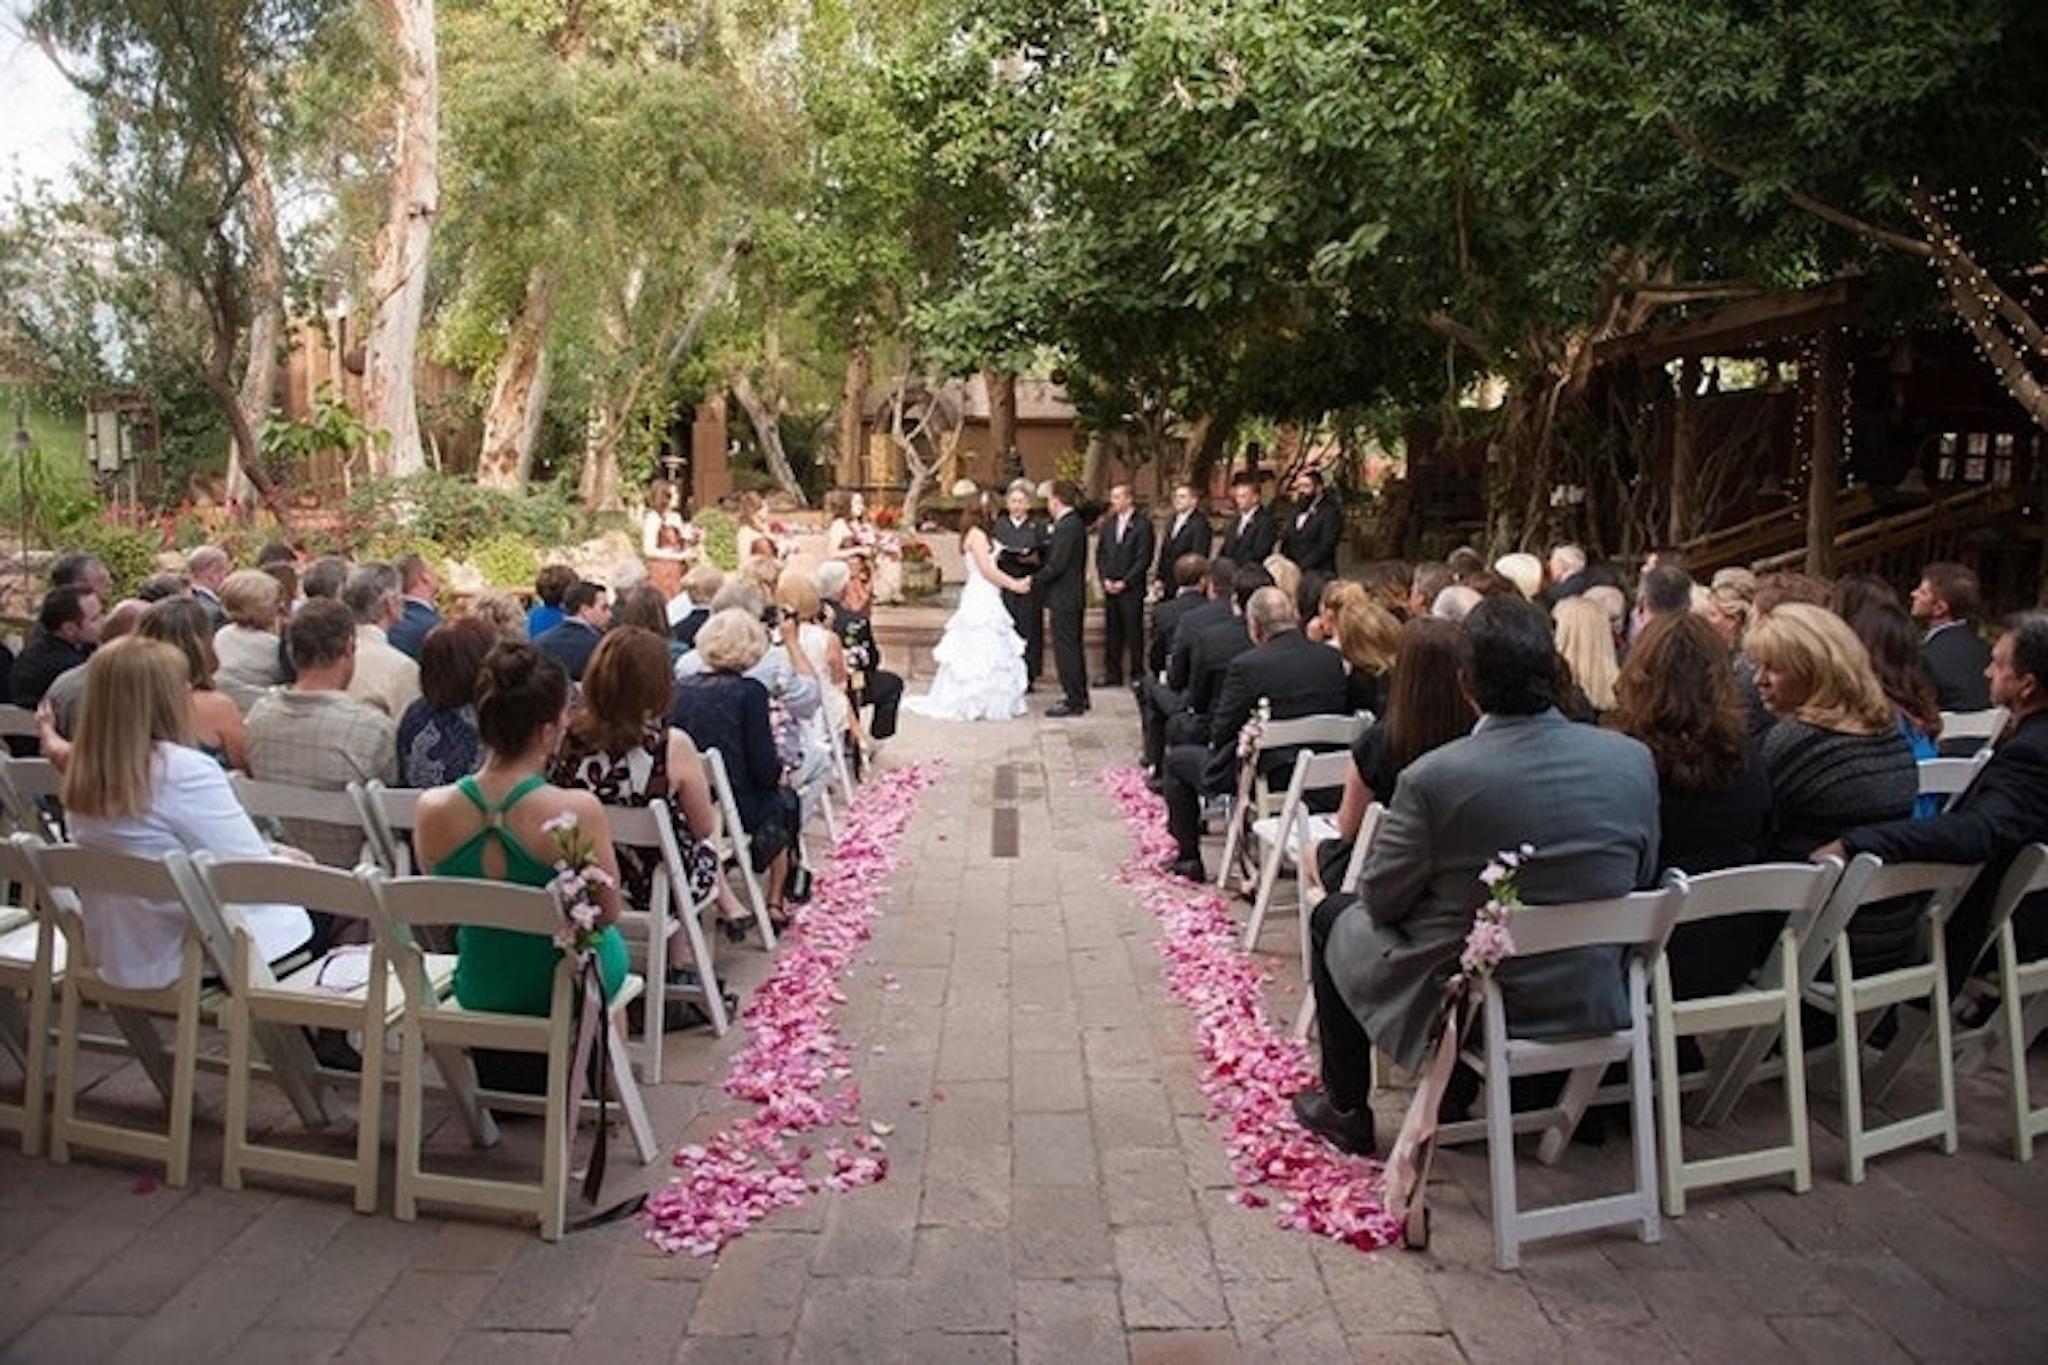 Boojum Tree Hidden Garden outdoor wedding venue